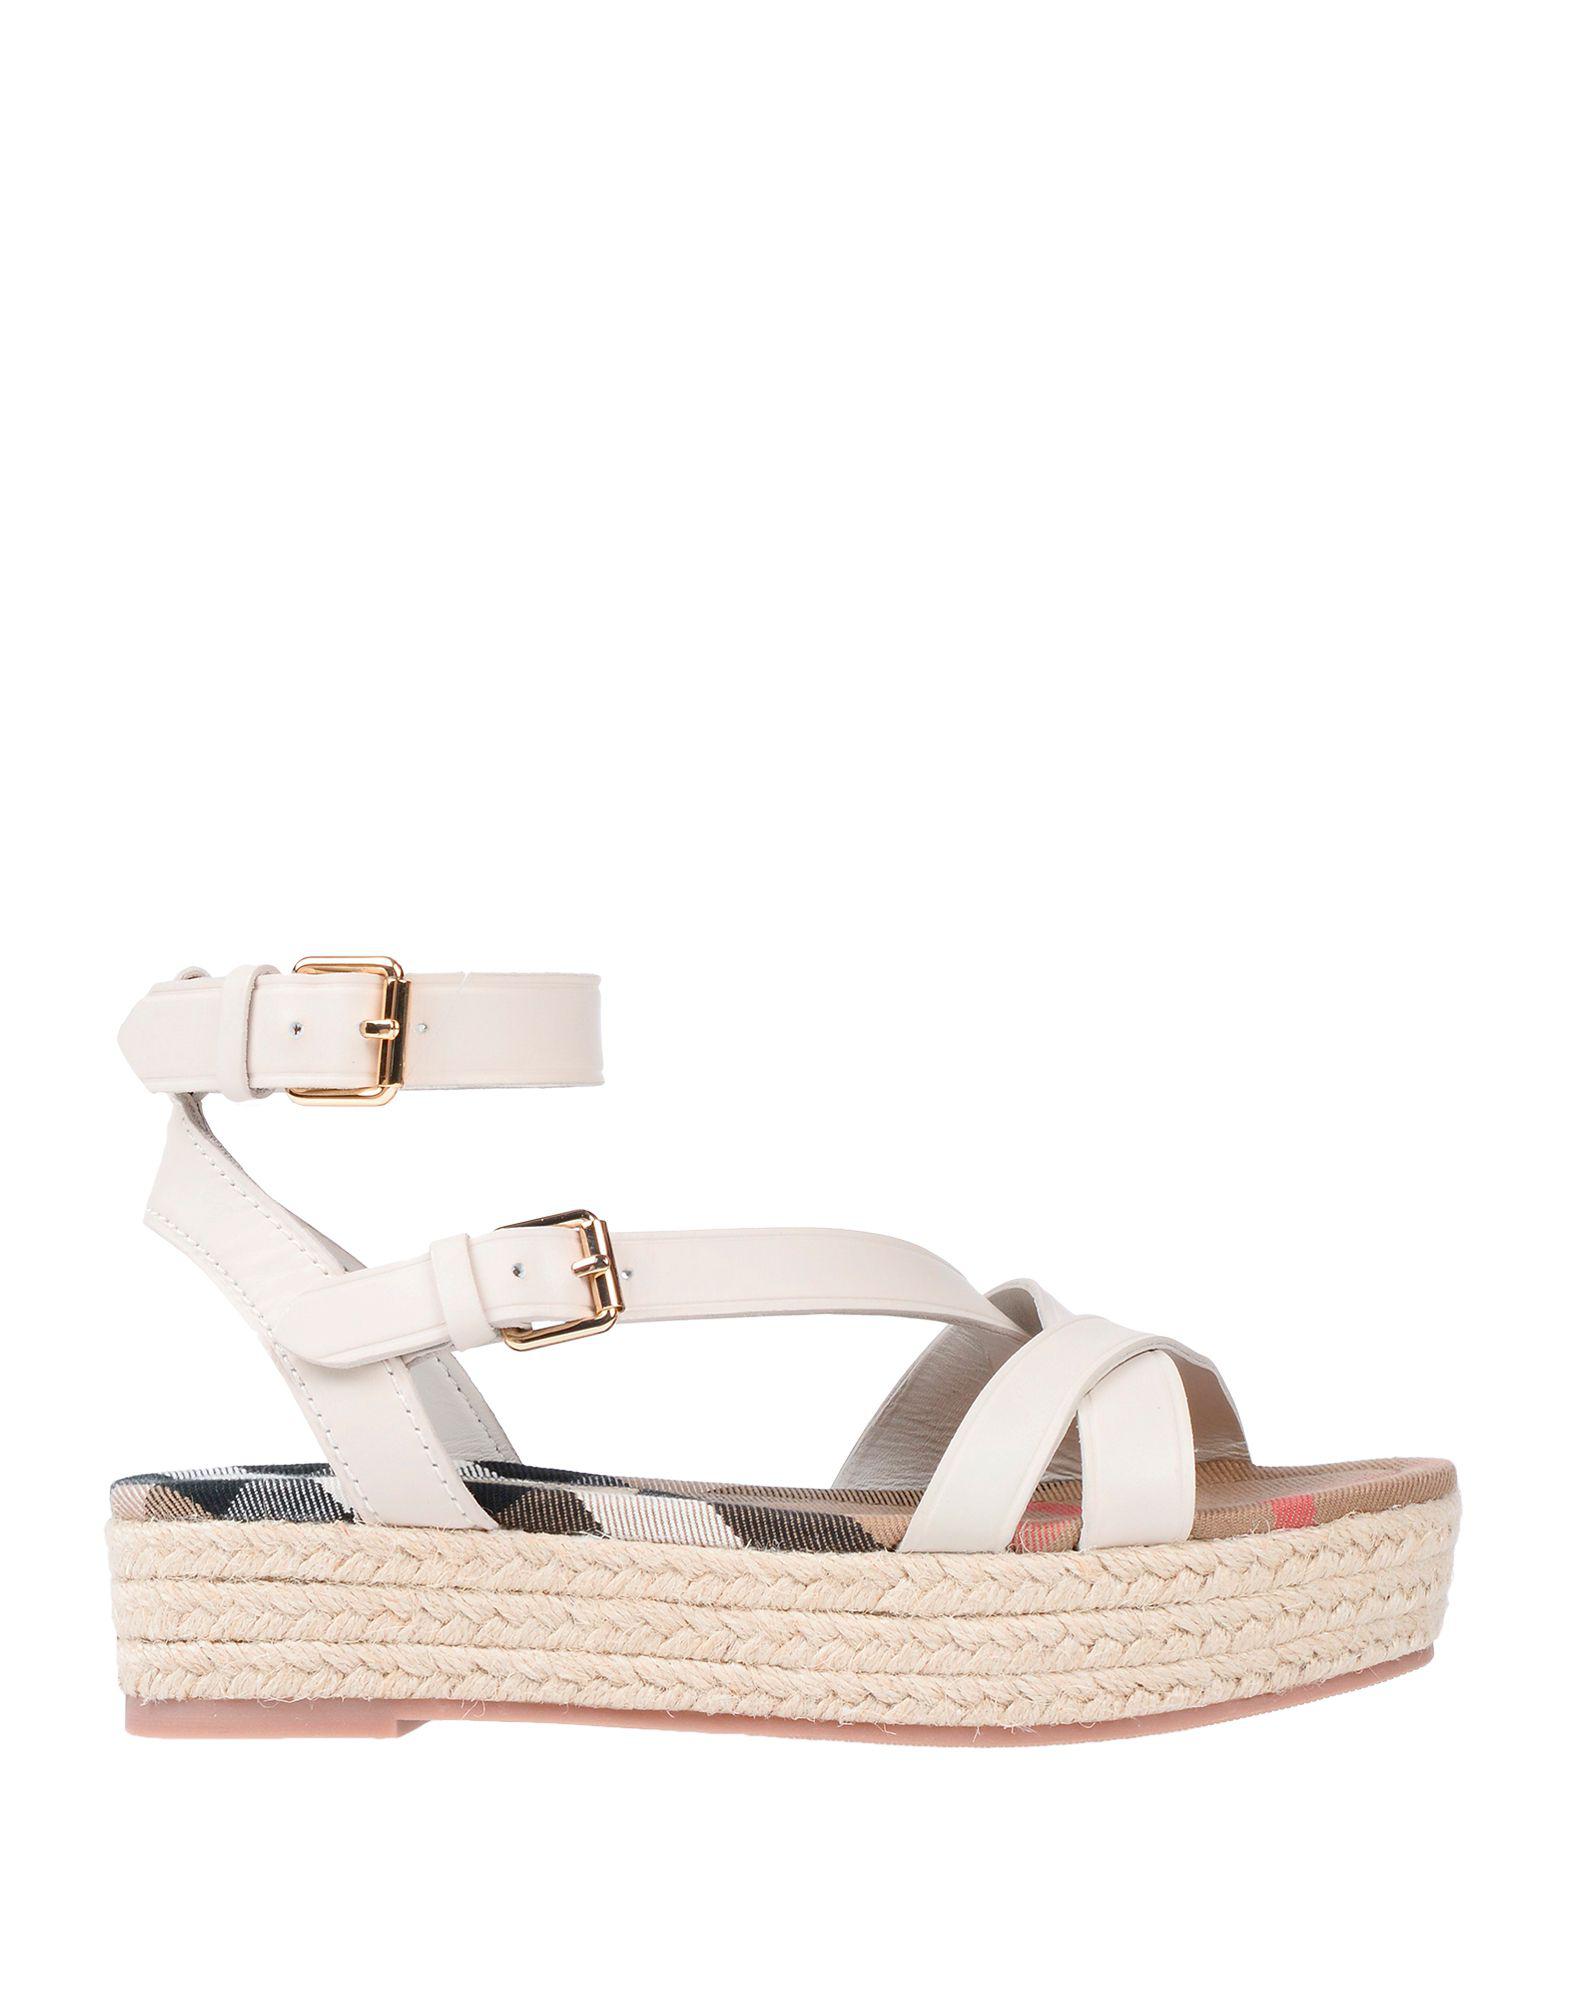 decfc75b40f4 Burberry Sandals In White